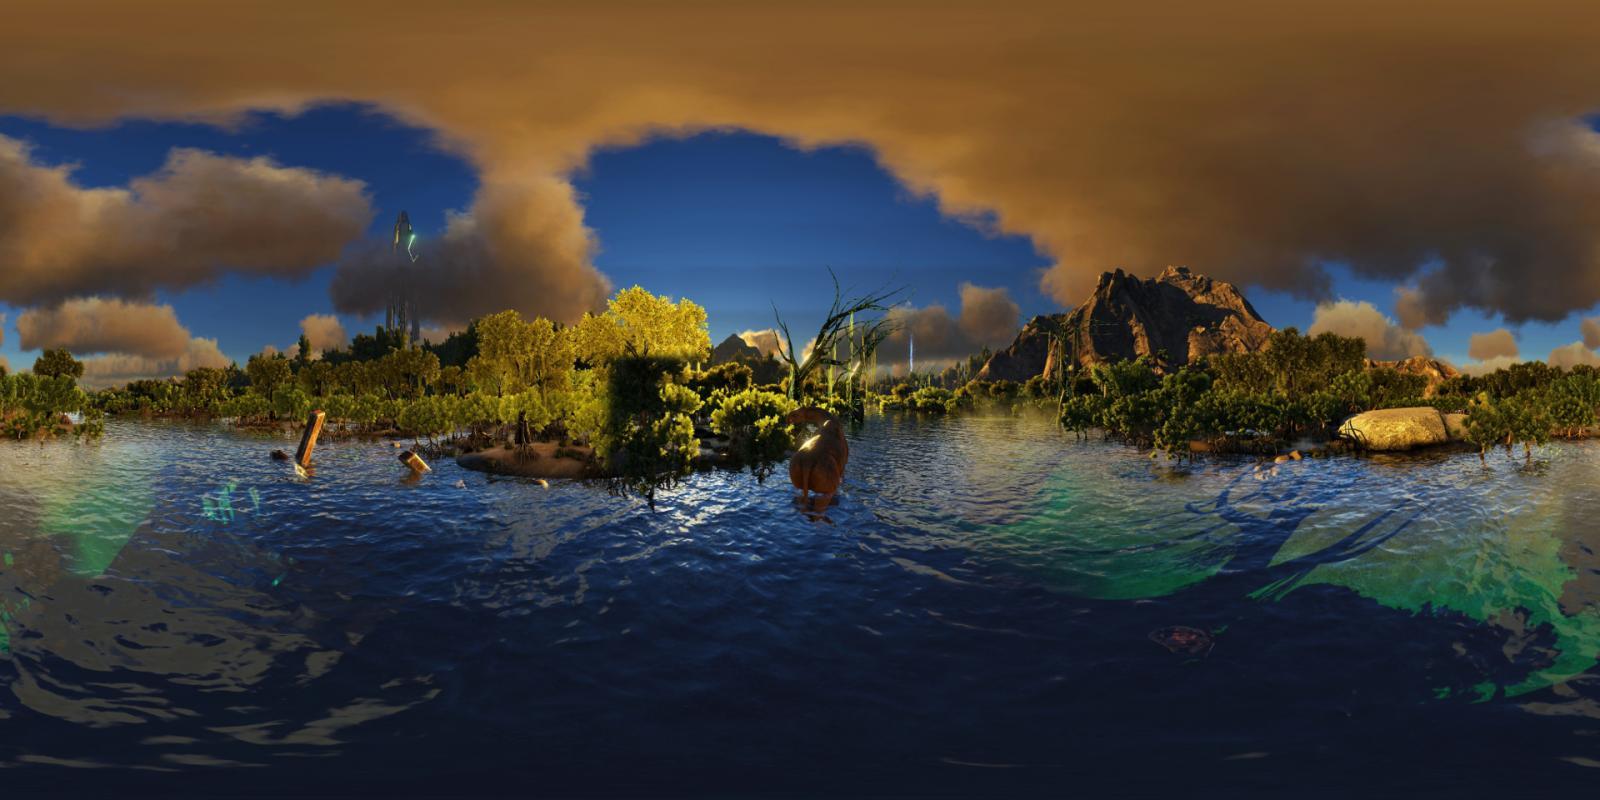 large.5a62ba9cac019_roguewolf91-LifeintheSwamp-Panoramic360Stereoscopic3D.jpg